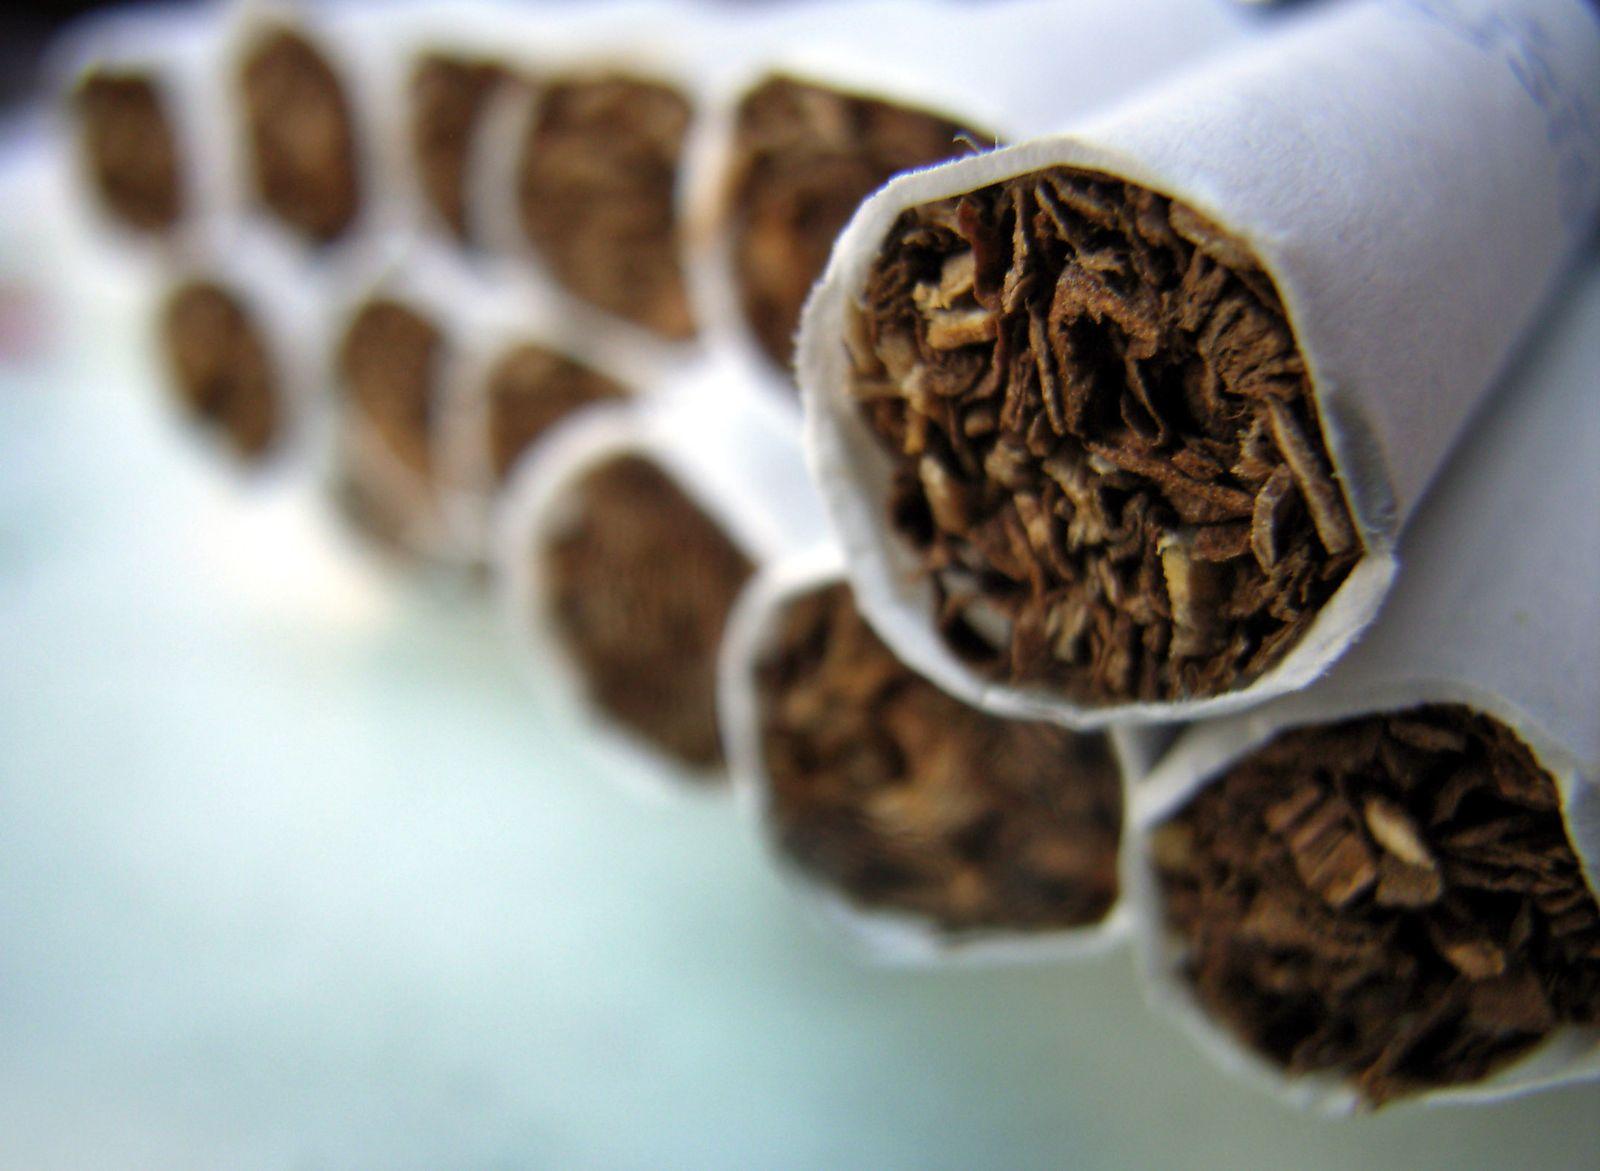 Symbolbild / Rauchen / Zigaretten / Tabak